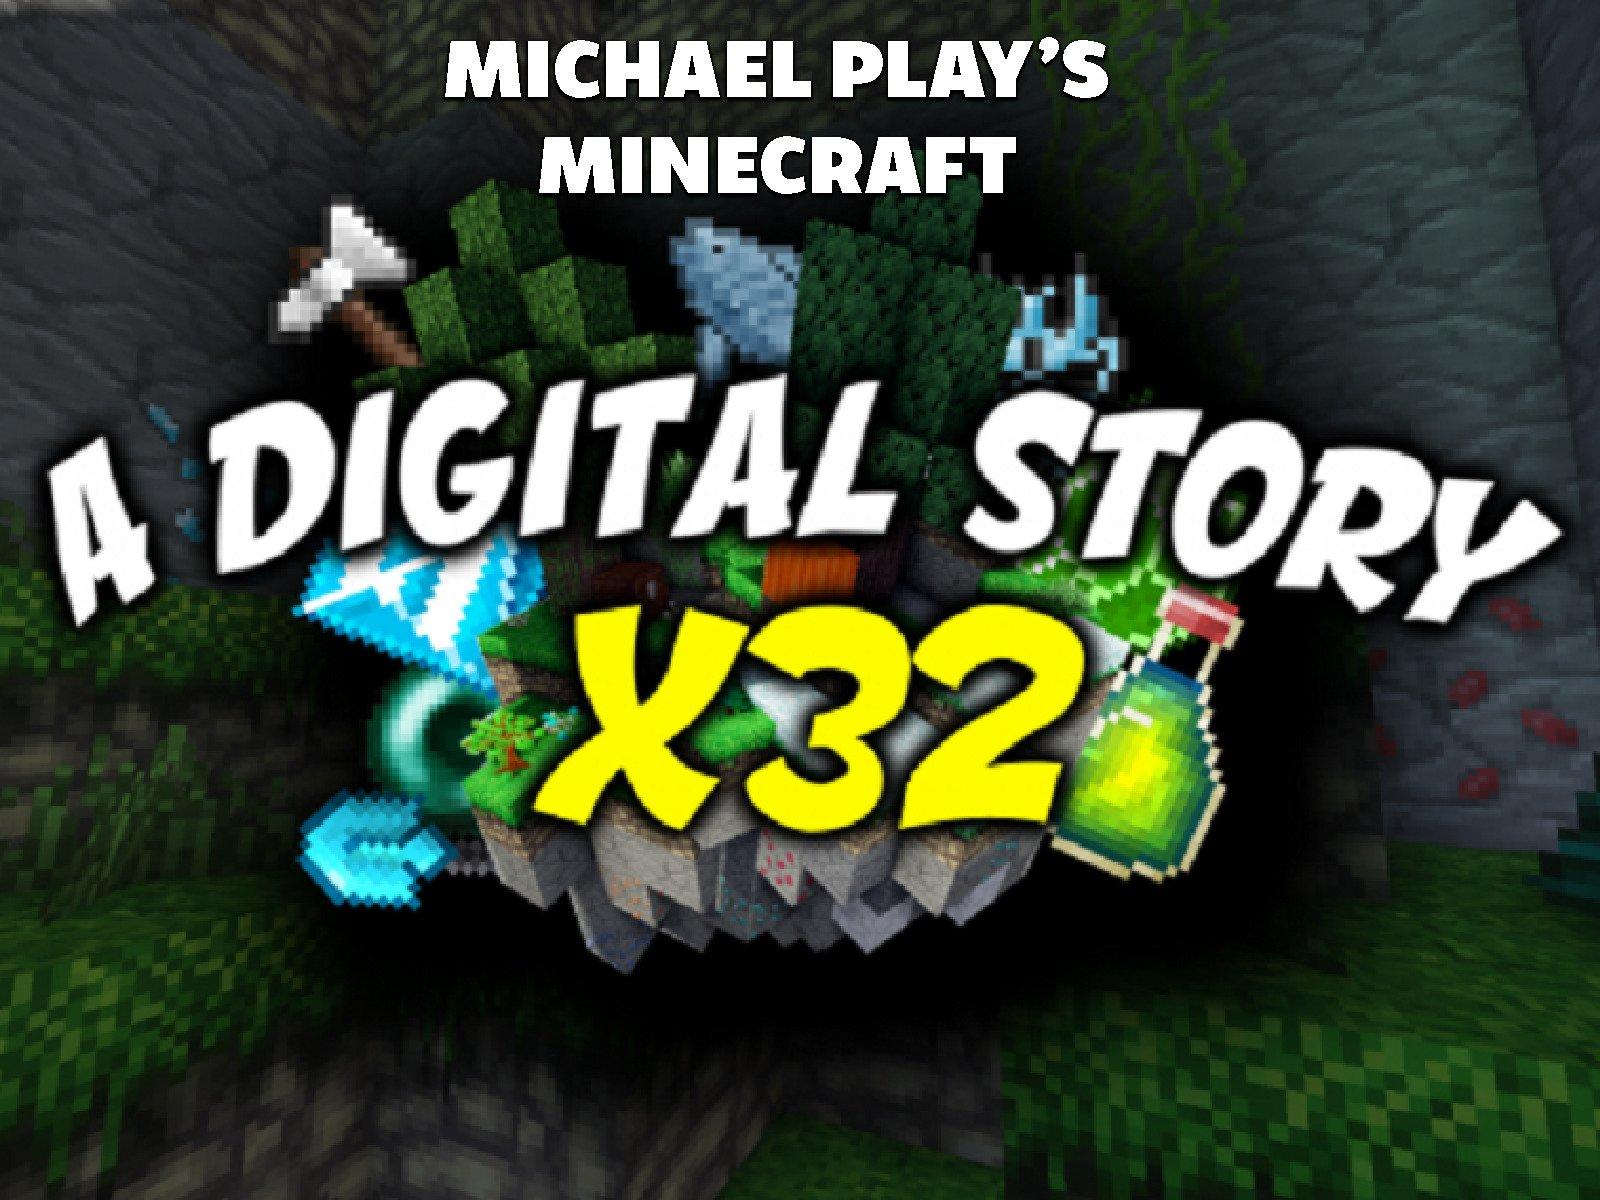 Michael Play's Minecraft Digital Story X32